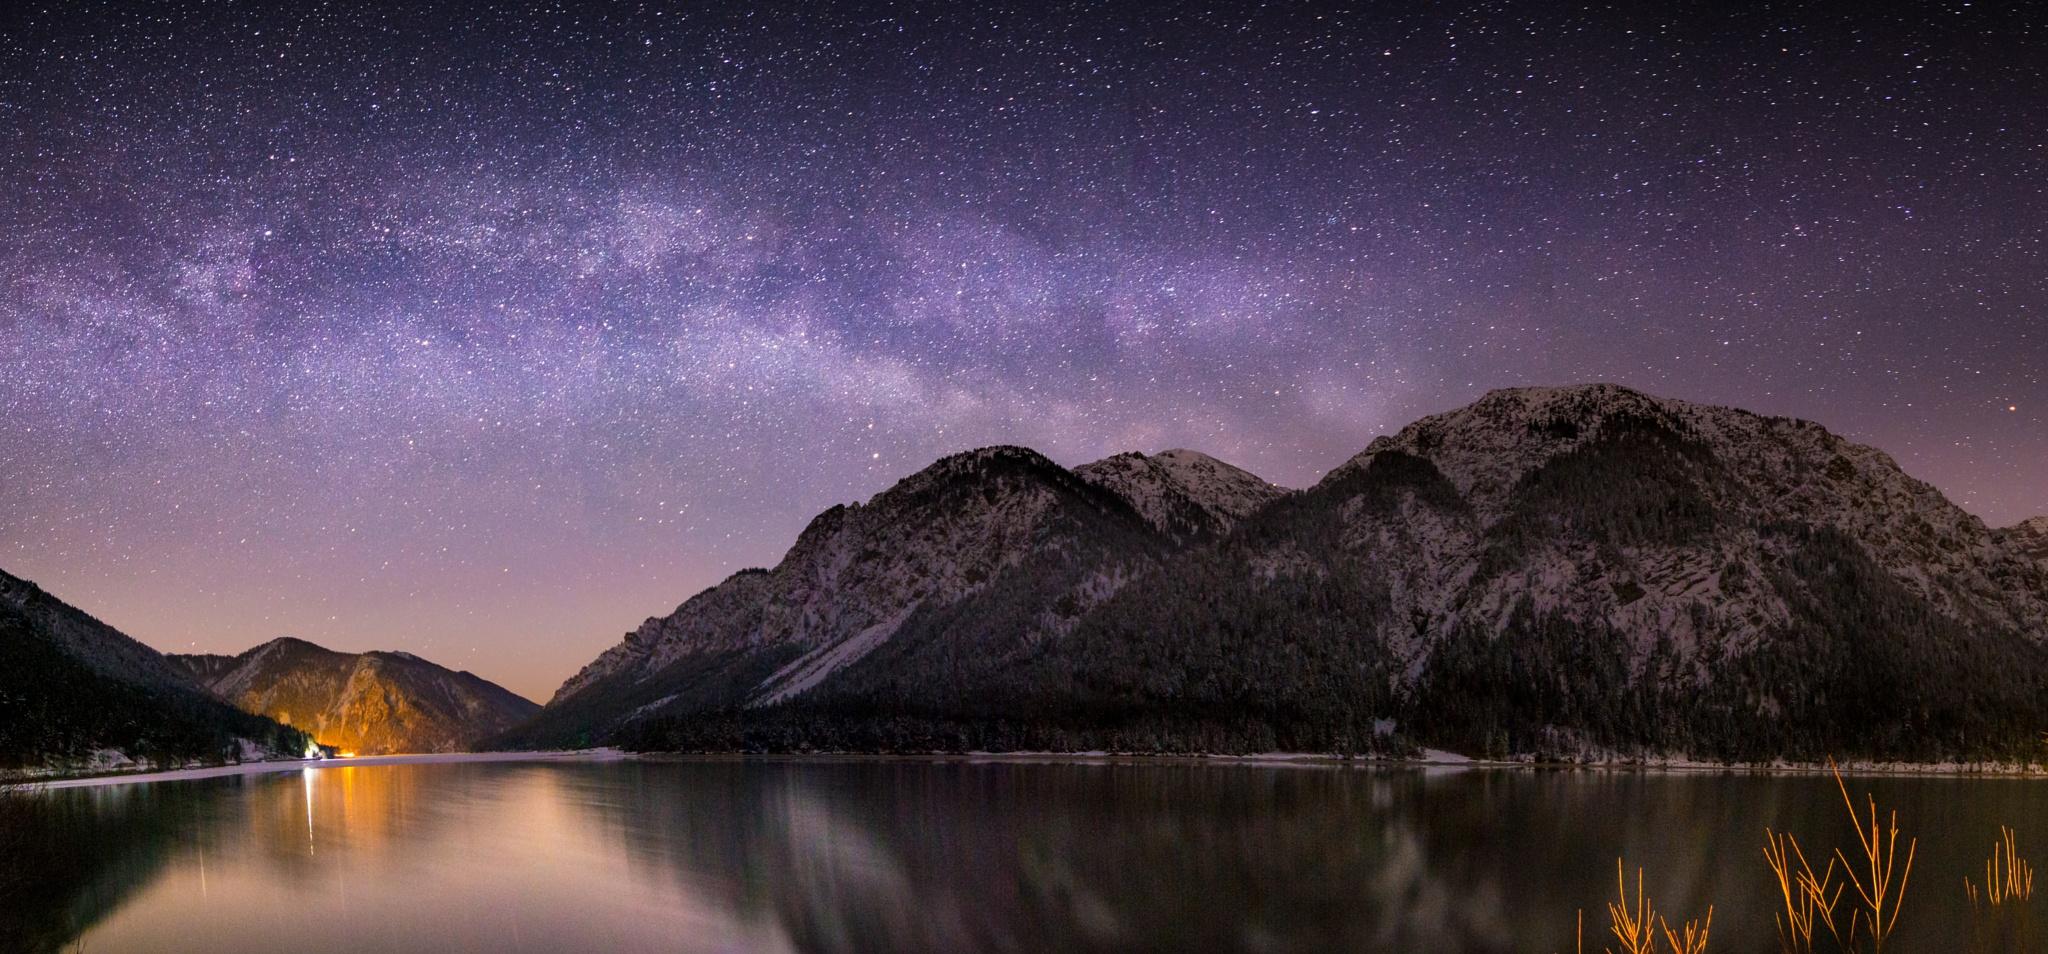 Milky way pano by Simon Kirchmair